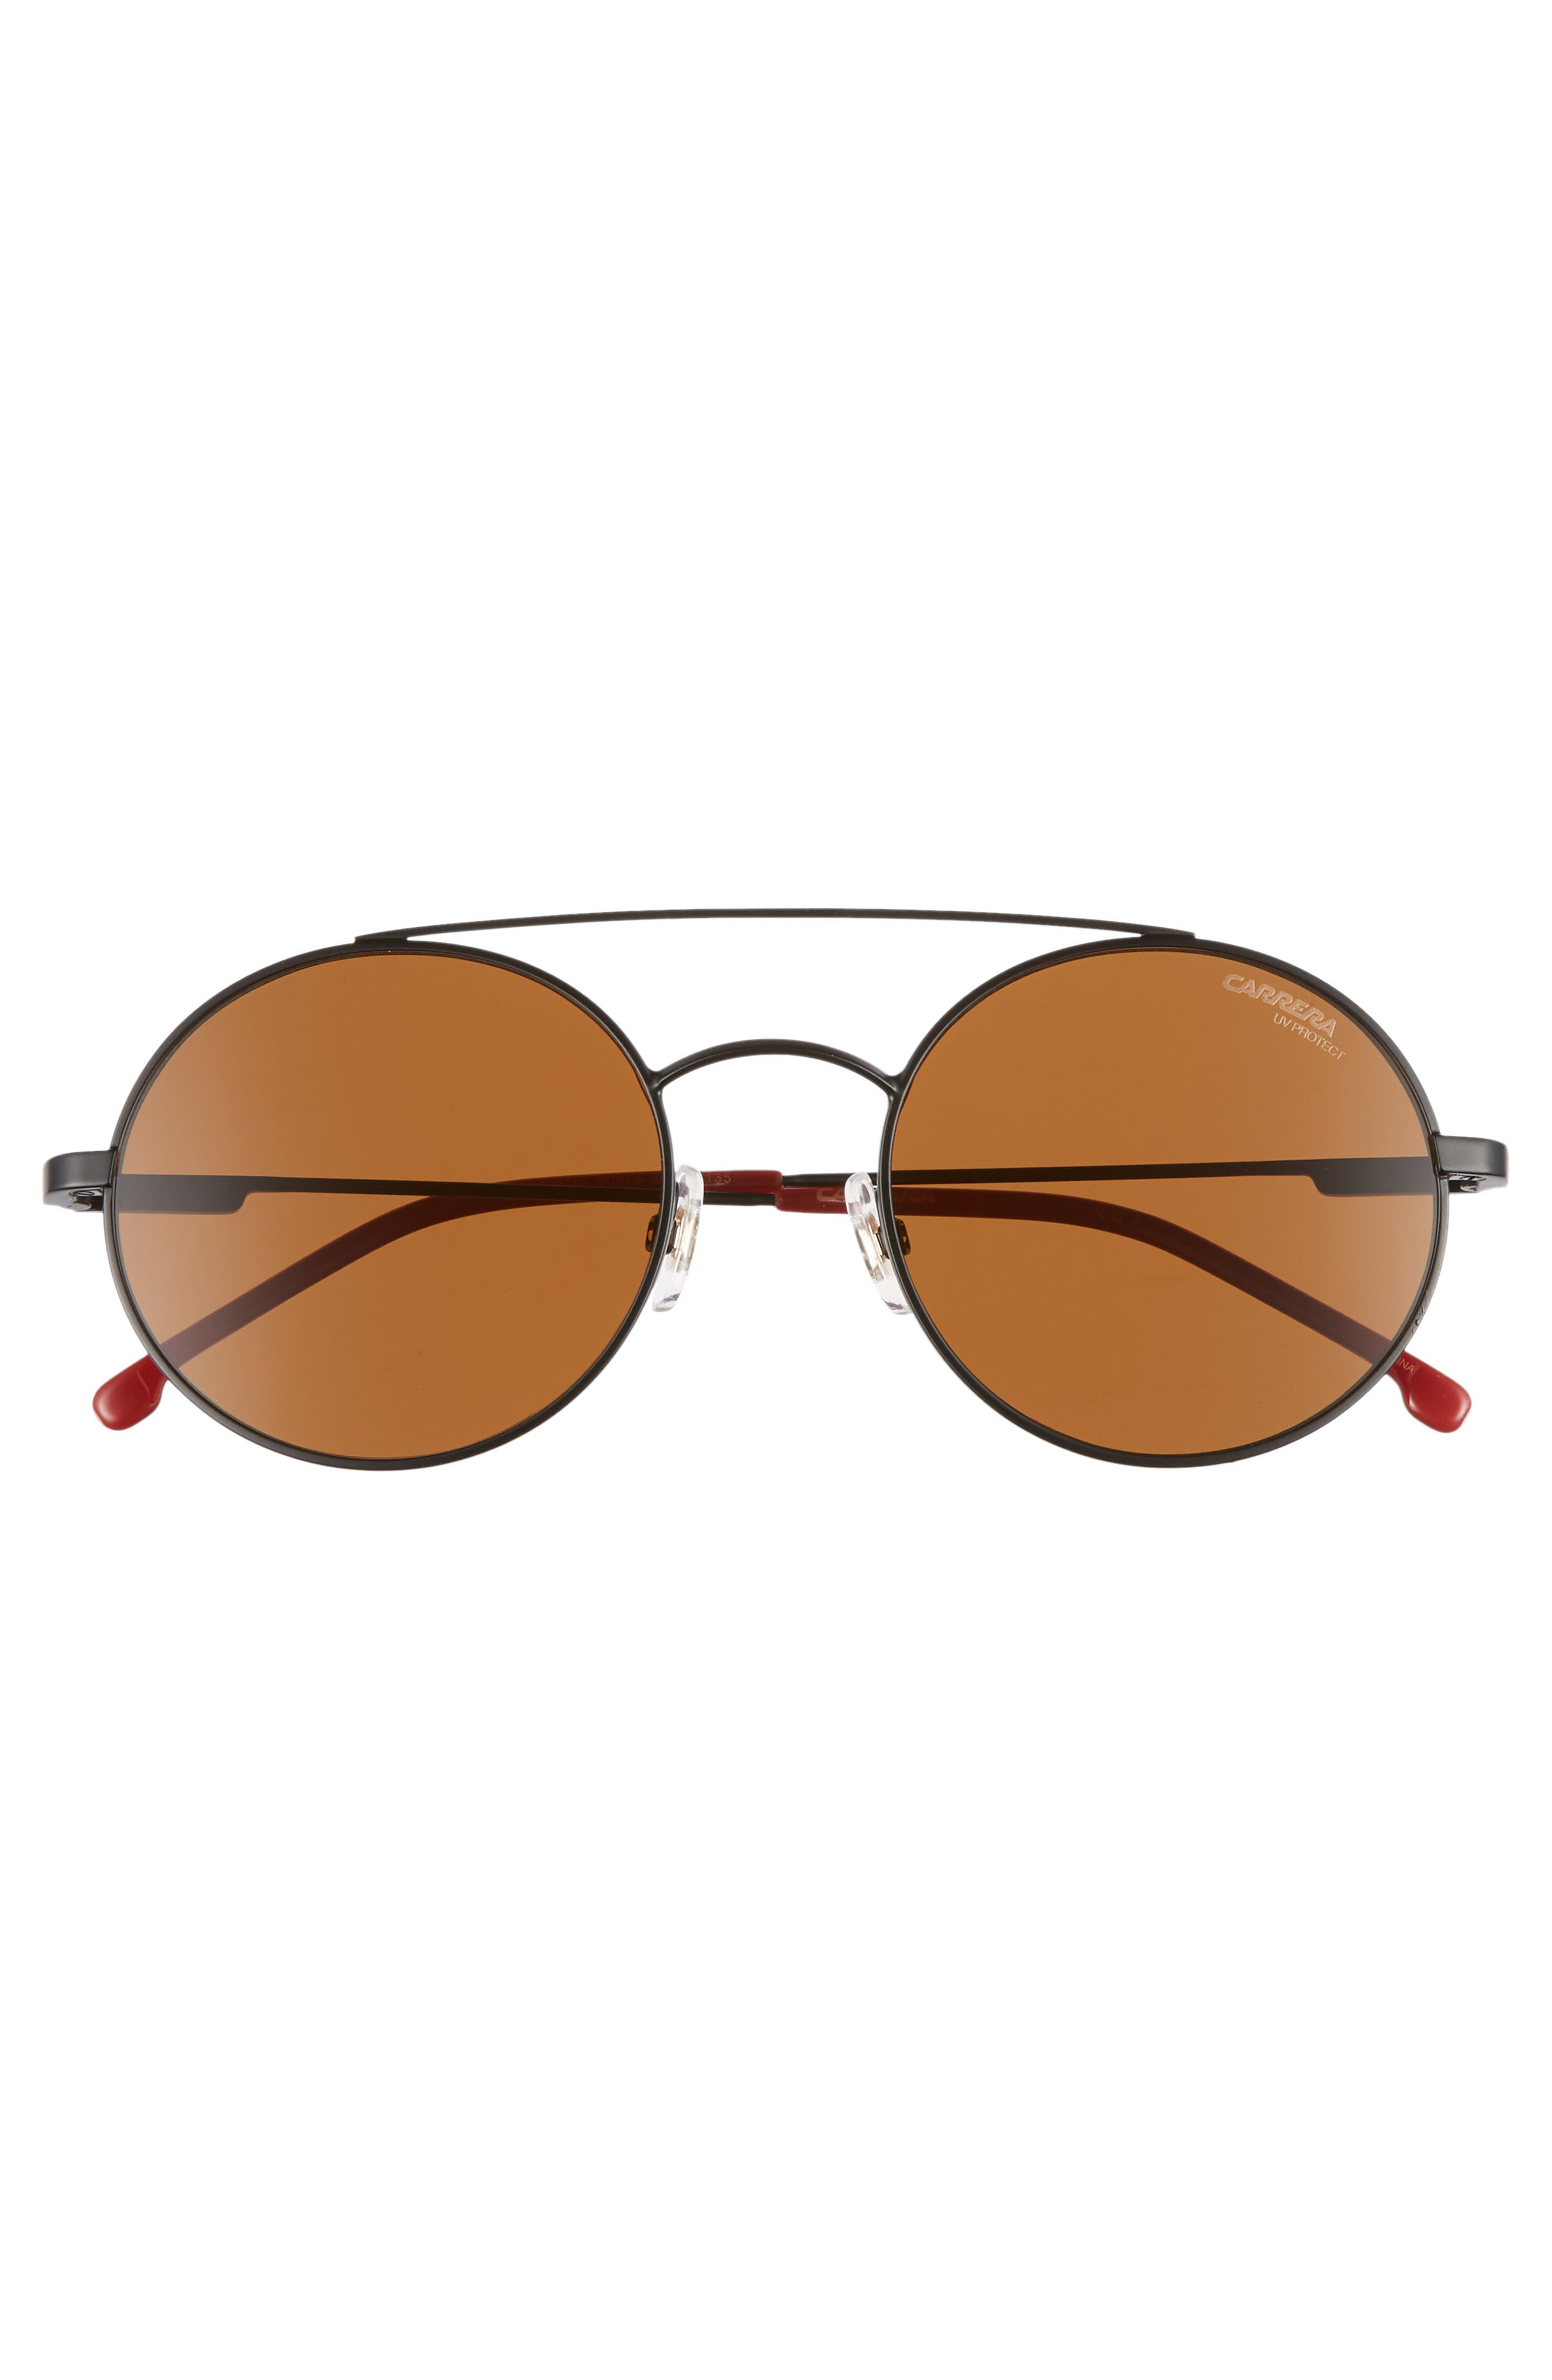 51mm Round Sunglasses,                             Alternate thumbnail 3, color,                             MATTE BLACK